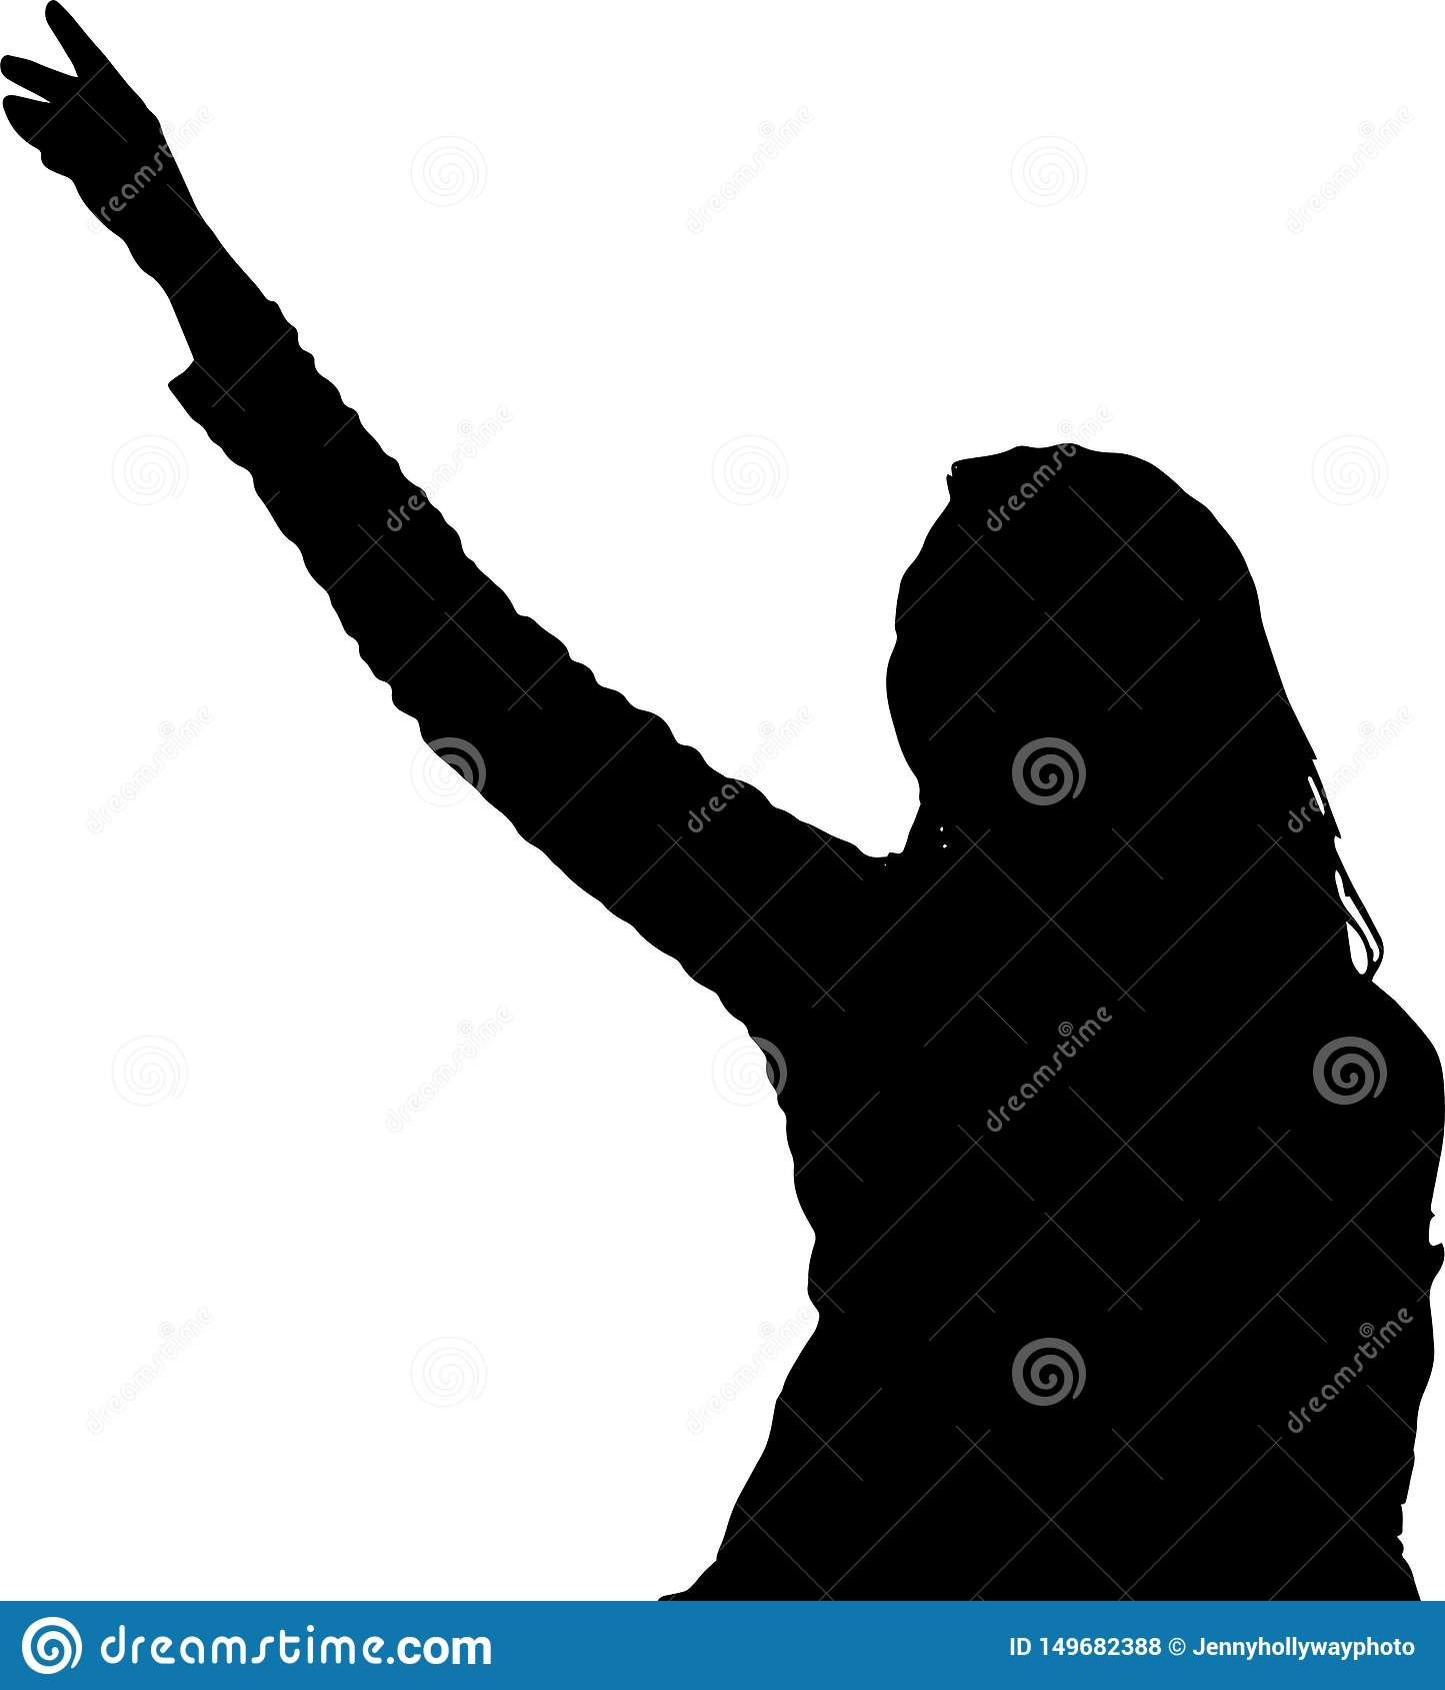 Dancing girl silhouettes shadow model figure